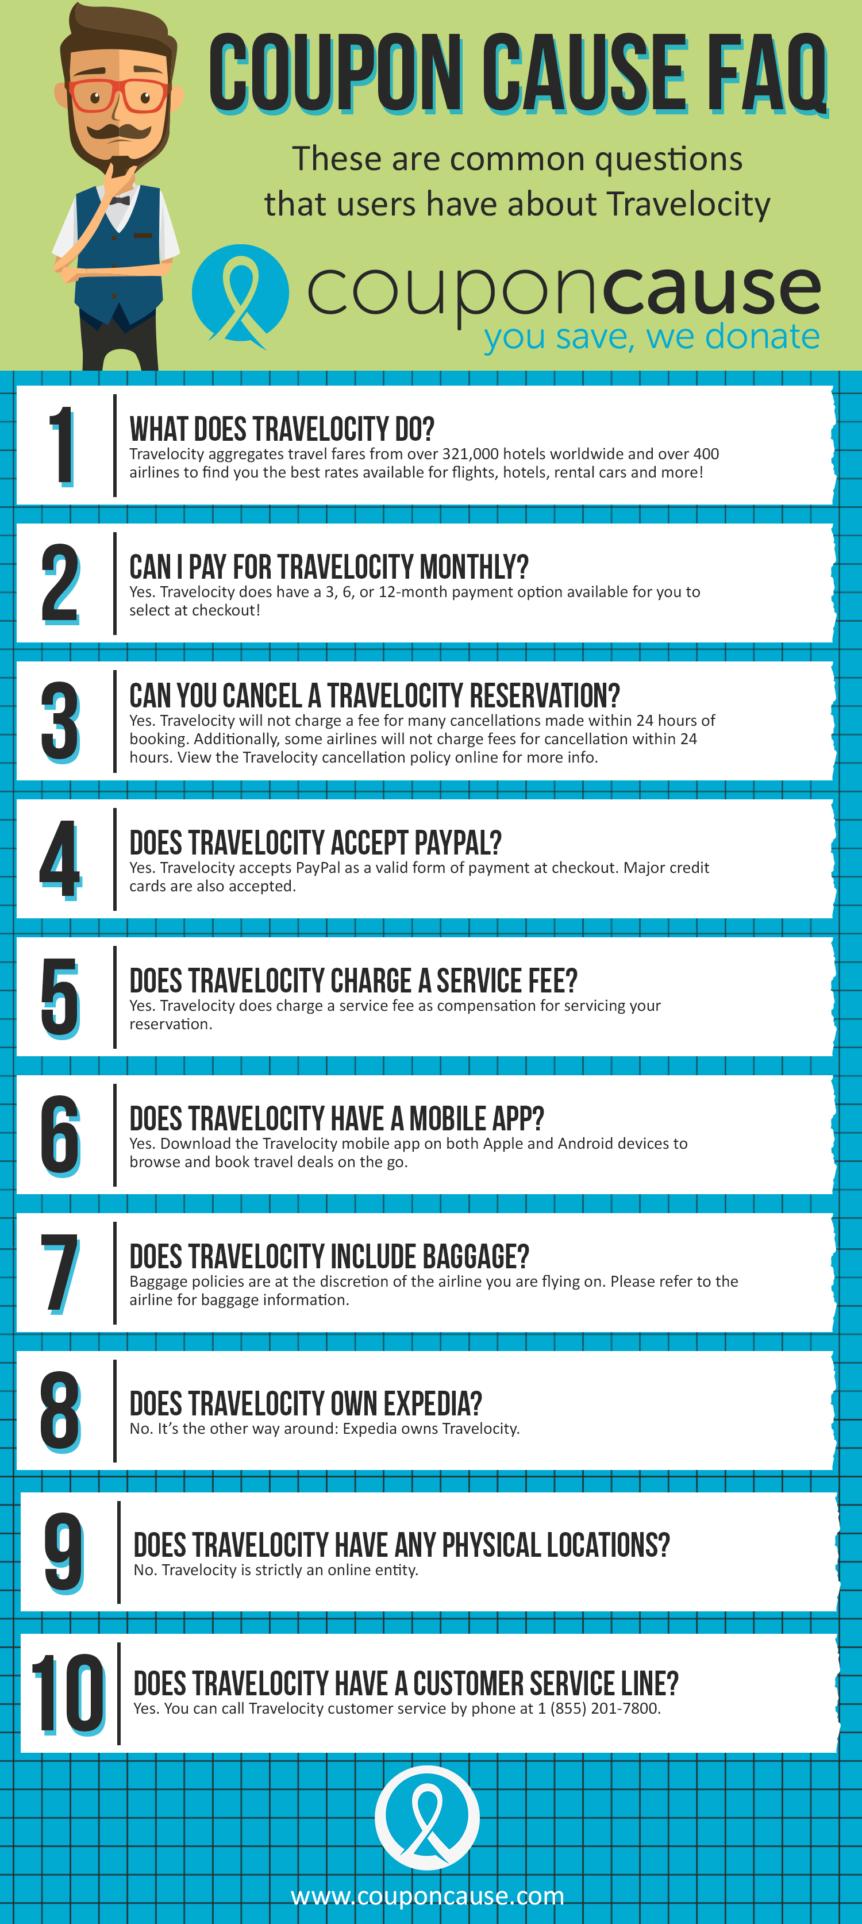 Travelocity Coupon Cause FAQ (C.C. FAQ)